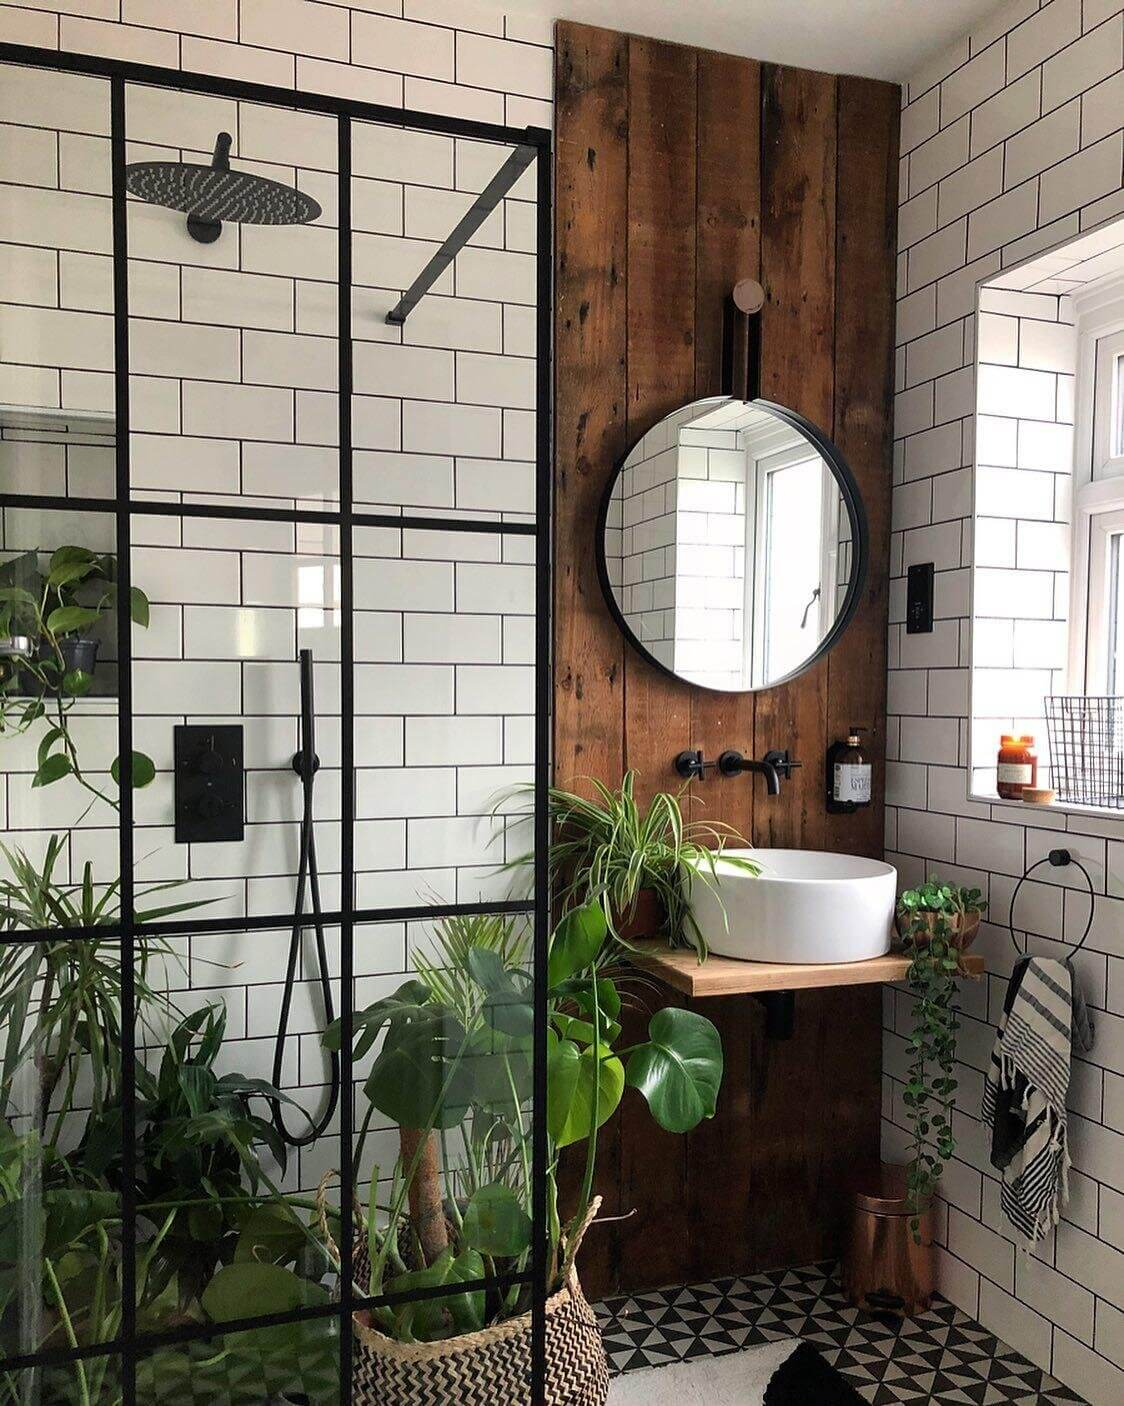 Small Bathroom Design Ideas Tips To, Small Bathroom Appear Bigger